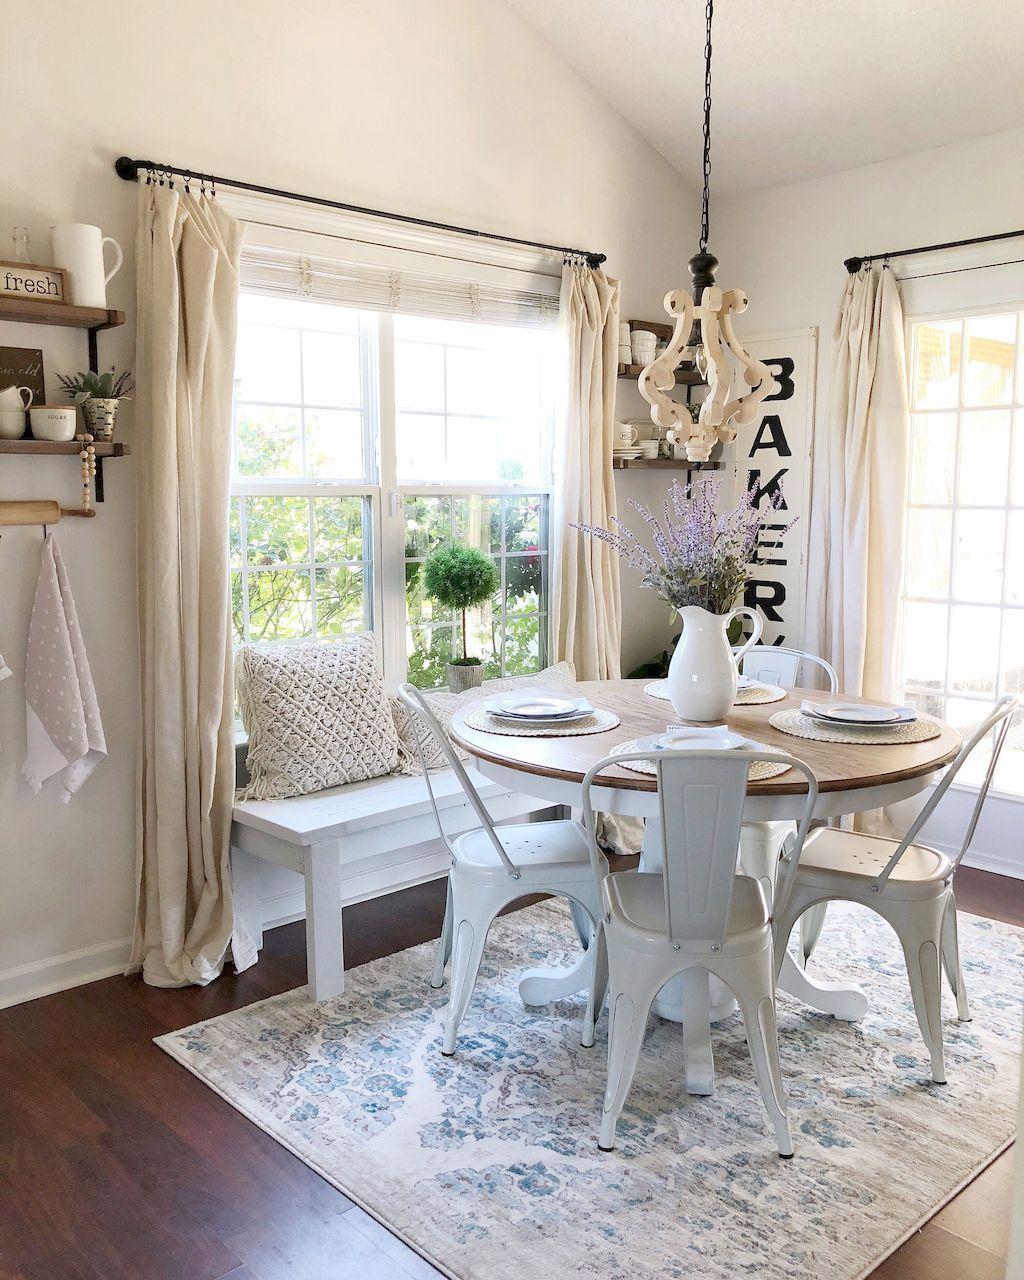 85 Beautiful Farmhouse Living Room Curtains Decor Ideas ... on Farmhouse Dining Room Curtain Ideas  id=78303